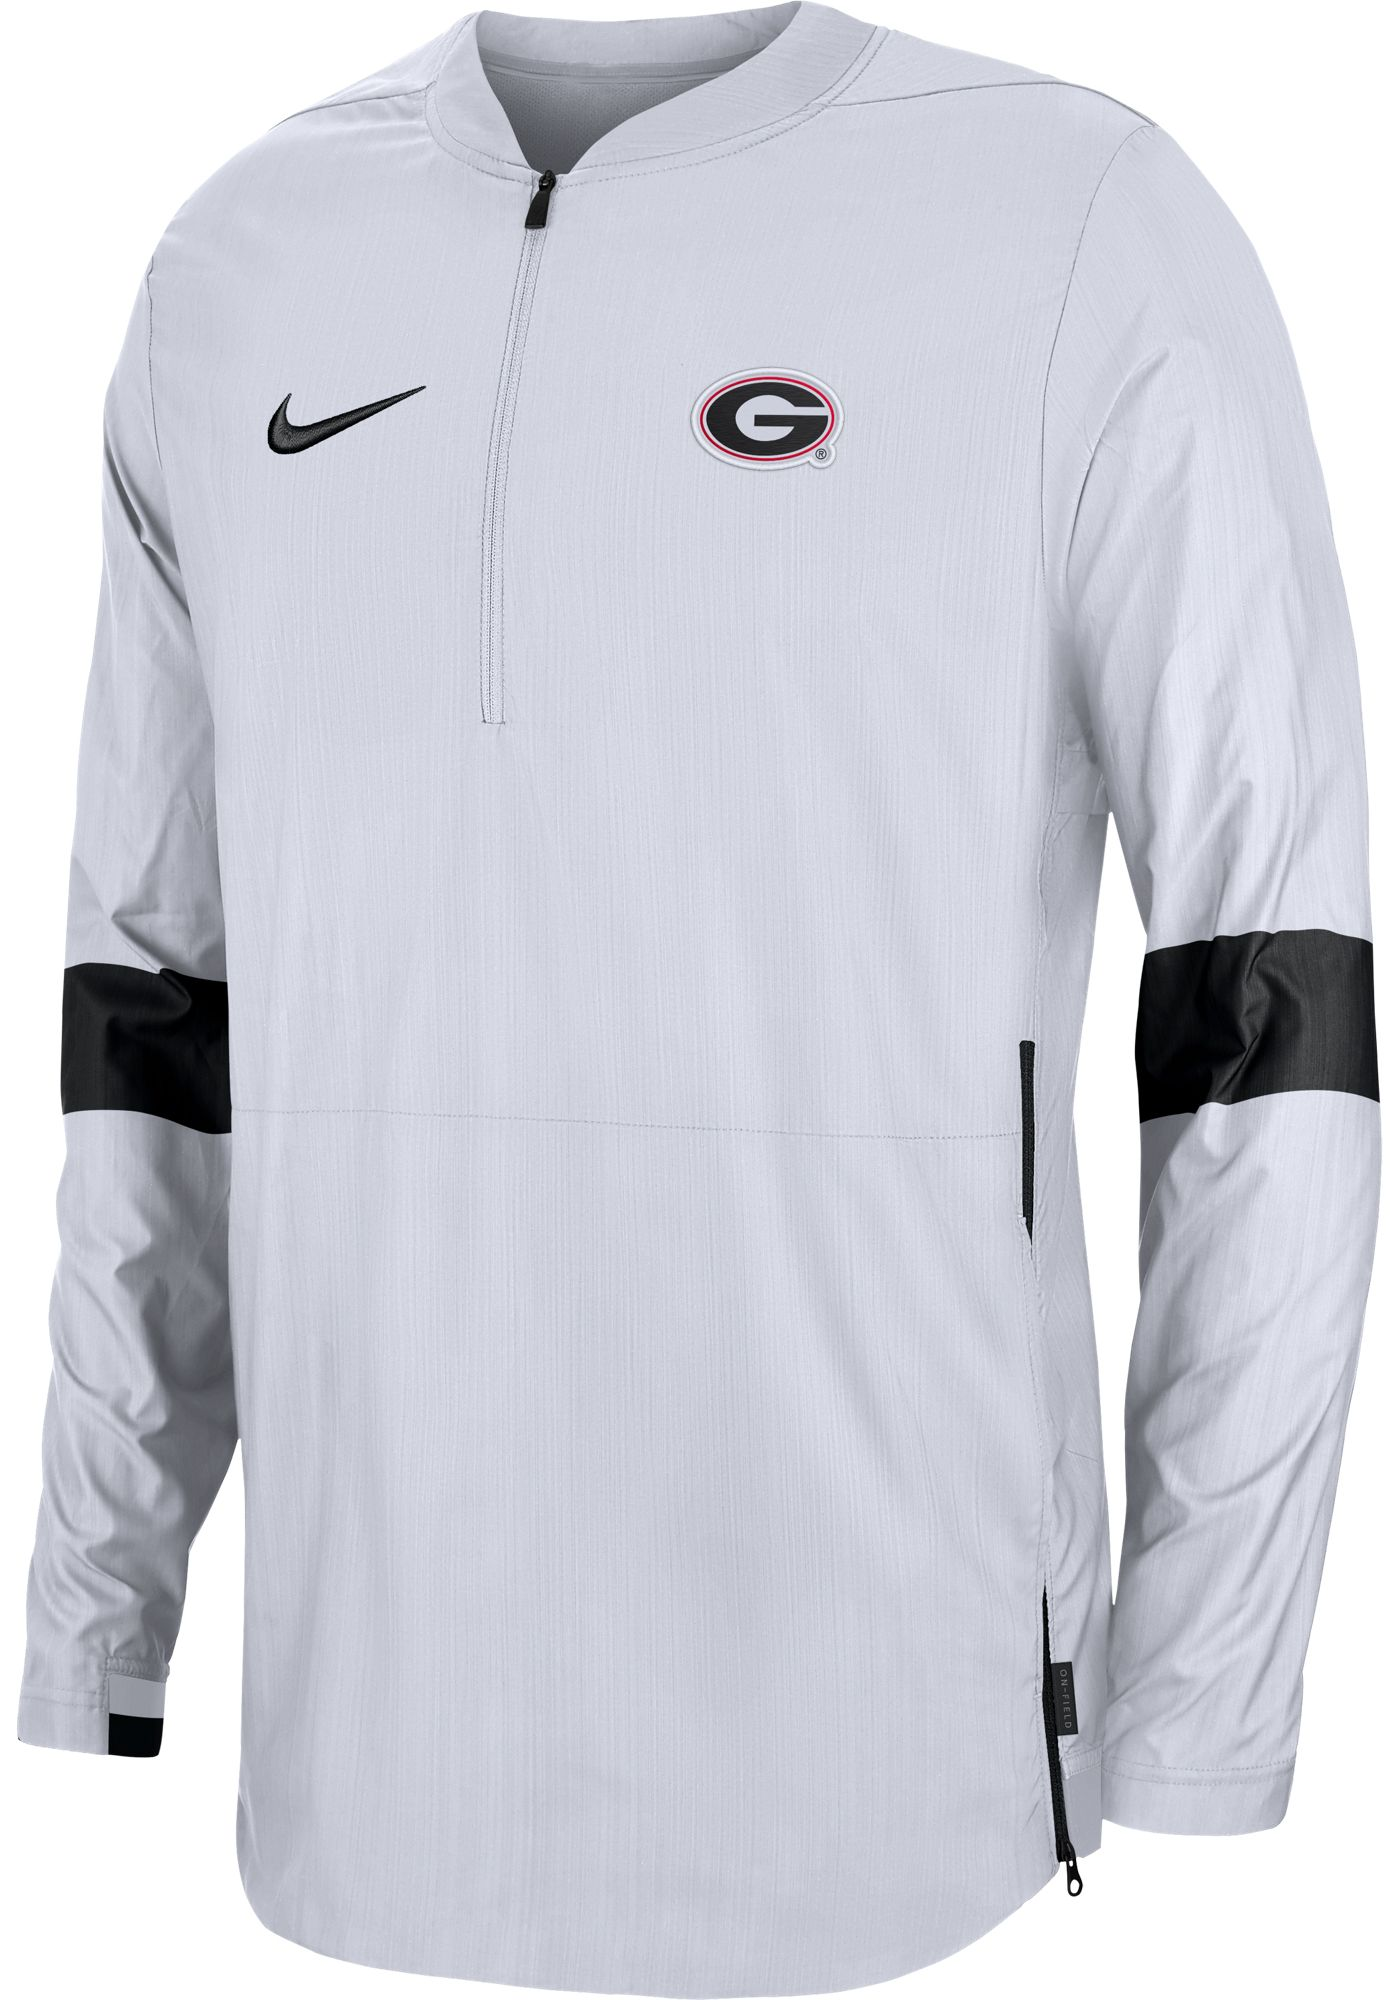 Nike Men's Georgia Bulldogs Lockdown Half-Zip Football White Jacket